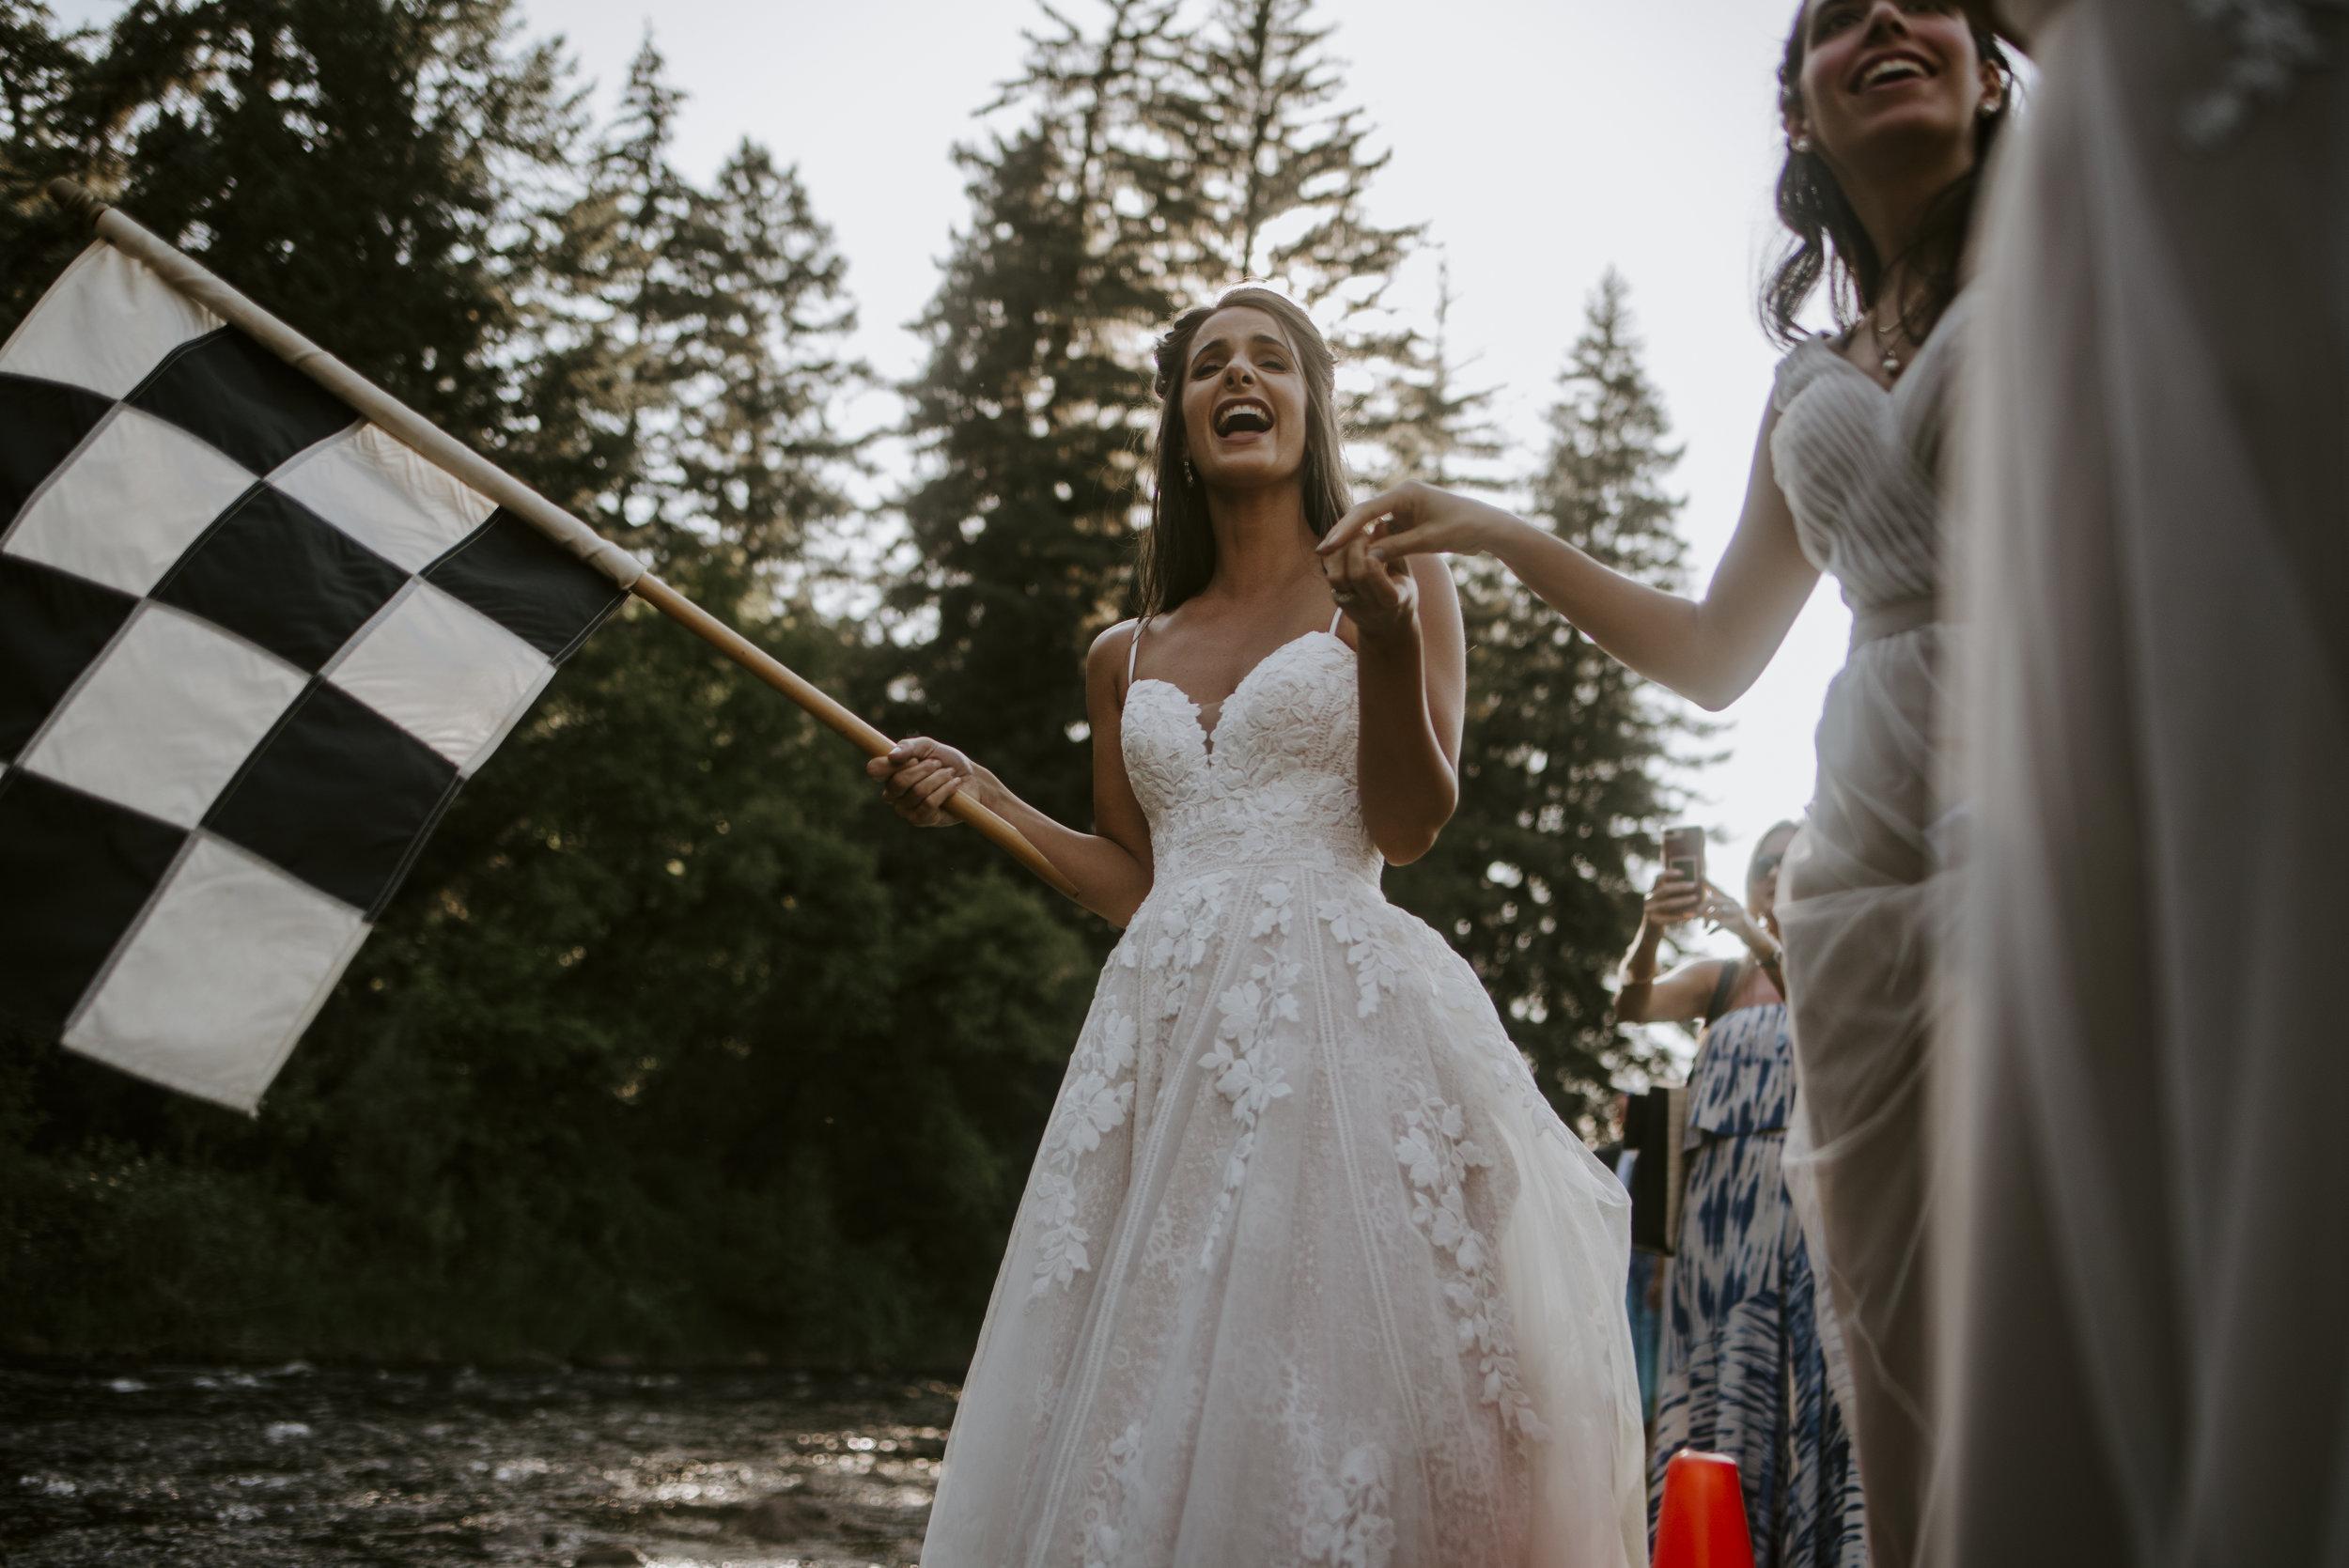 dallenbach_ranch_wedding_photographer30.jpg